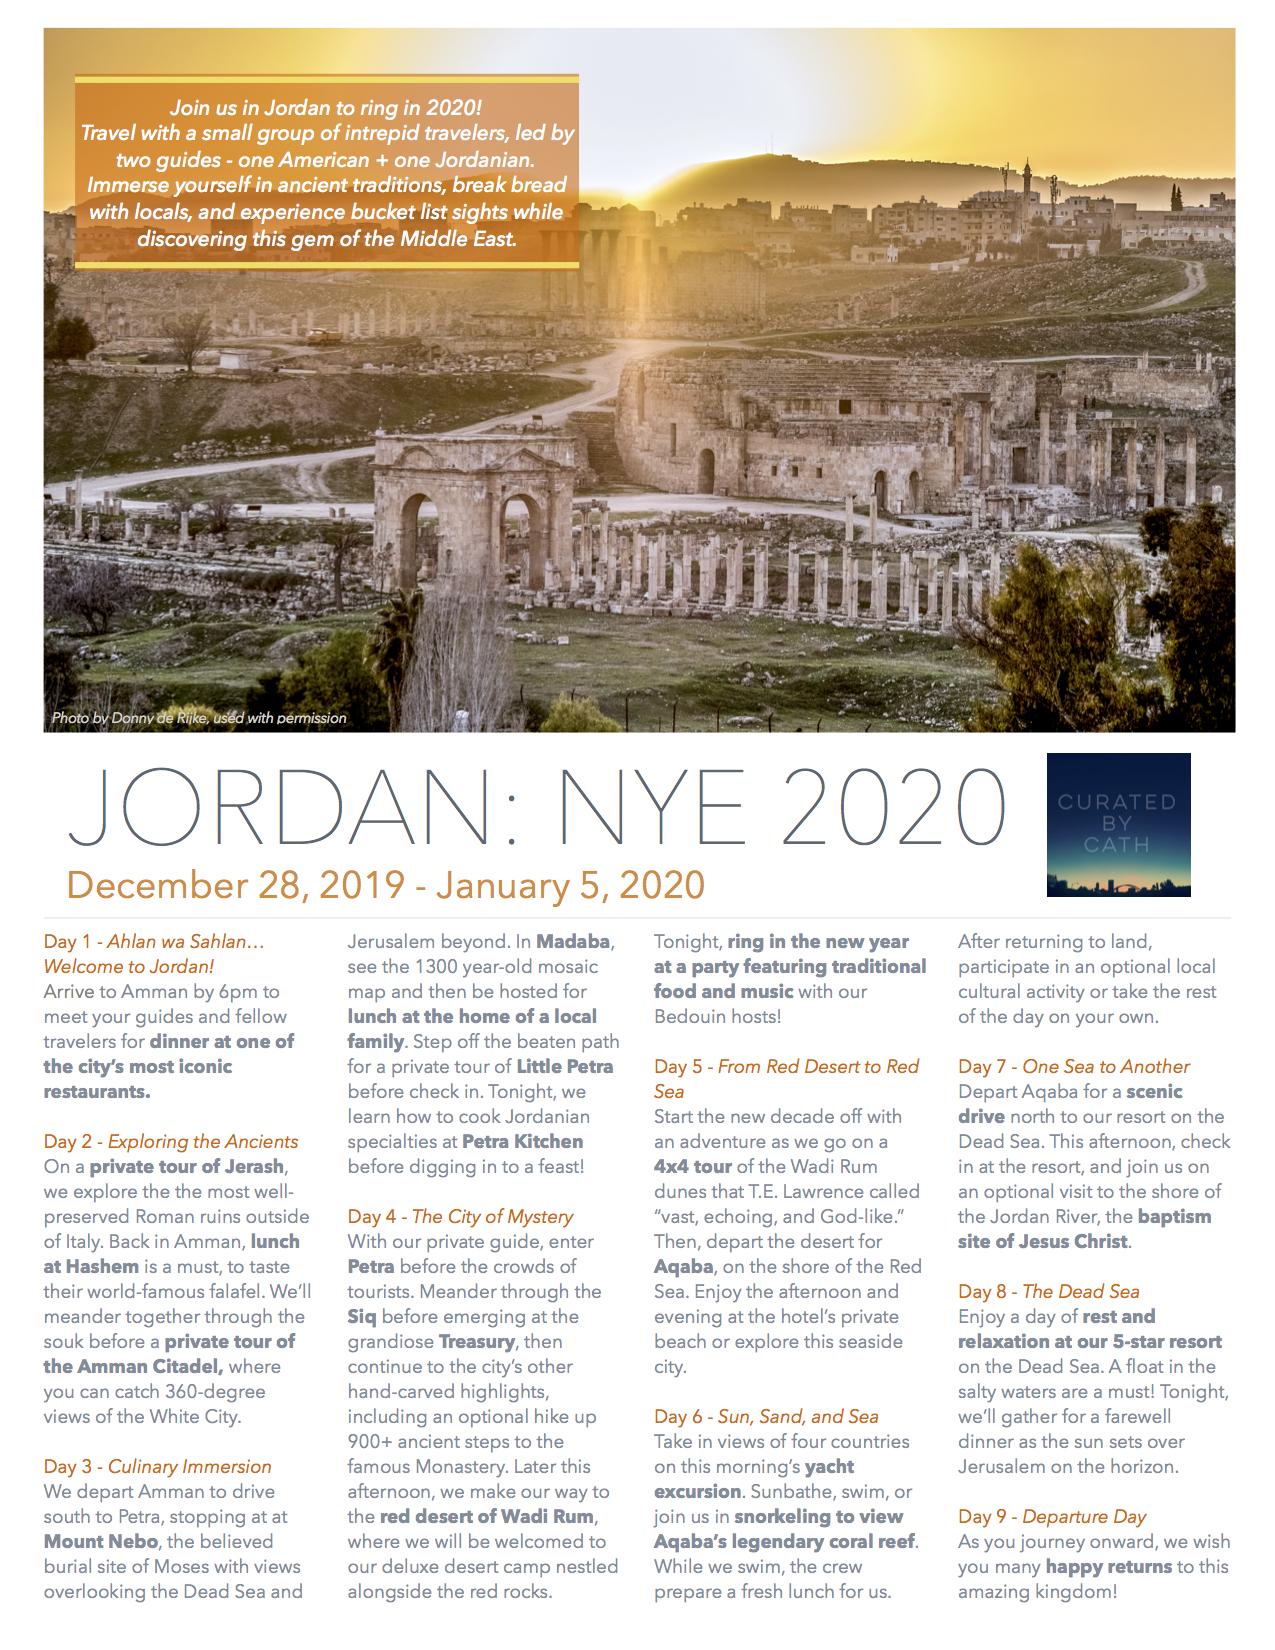 Jordan NYE 2020 high quality.jpg